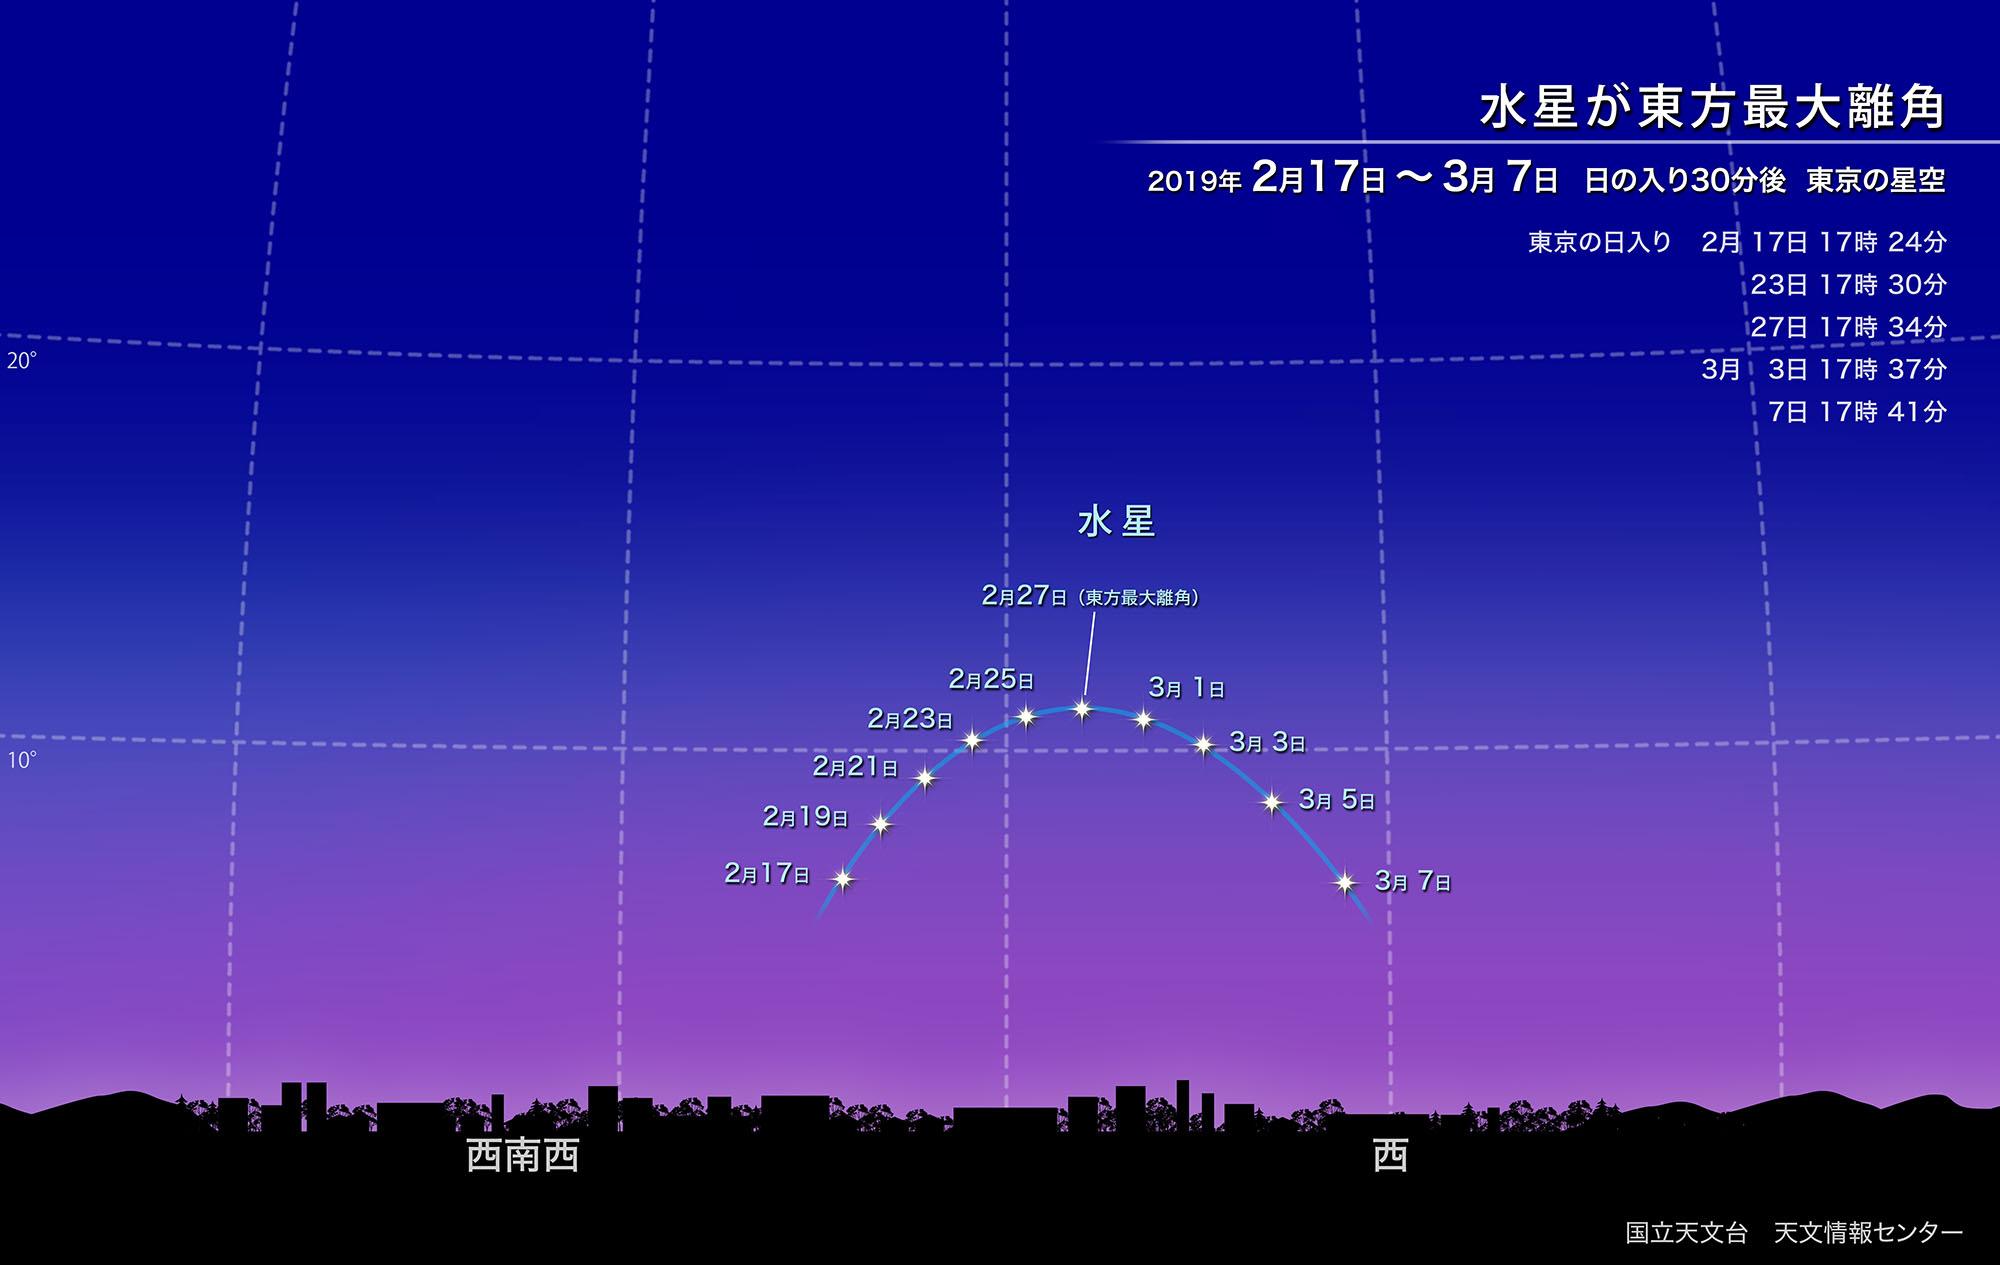 金星と土星が接近(2019年2月) | 国立天文台(NAOJ)